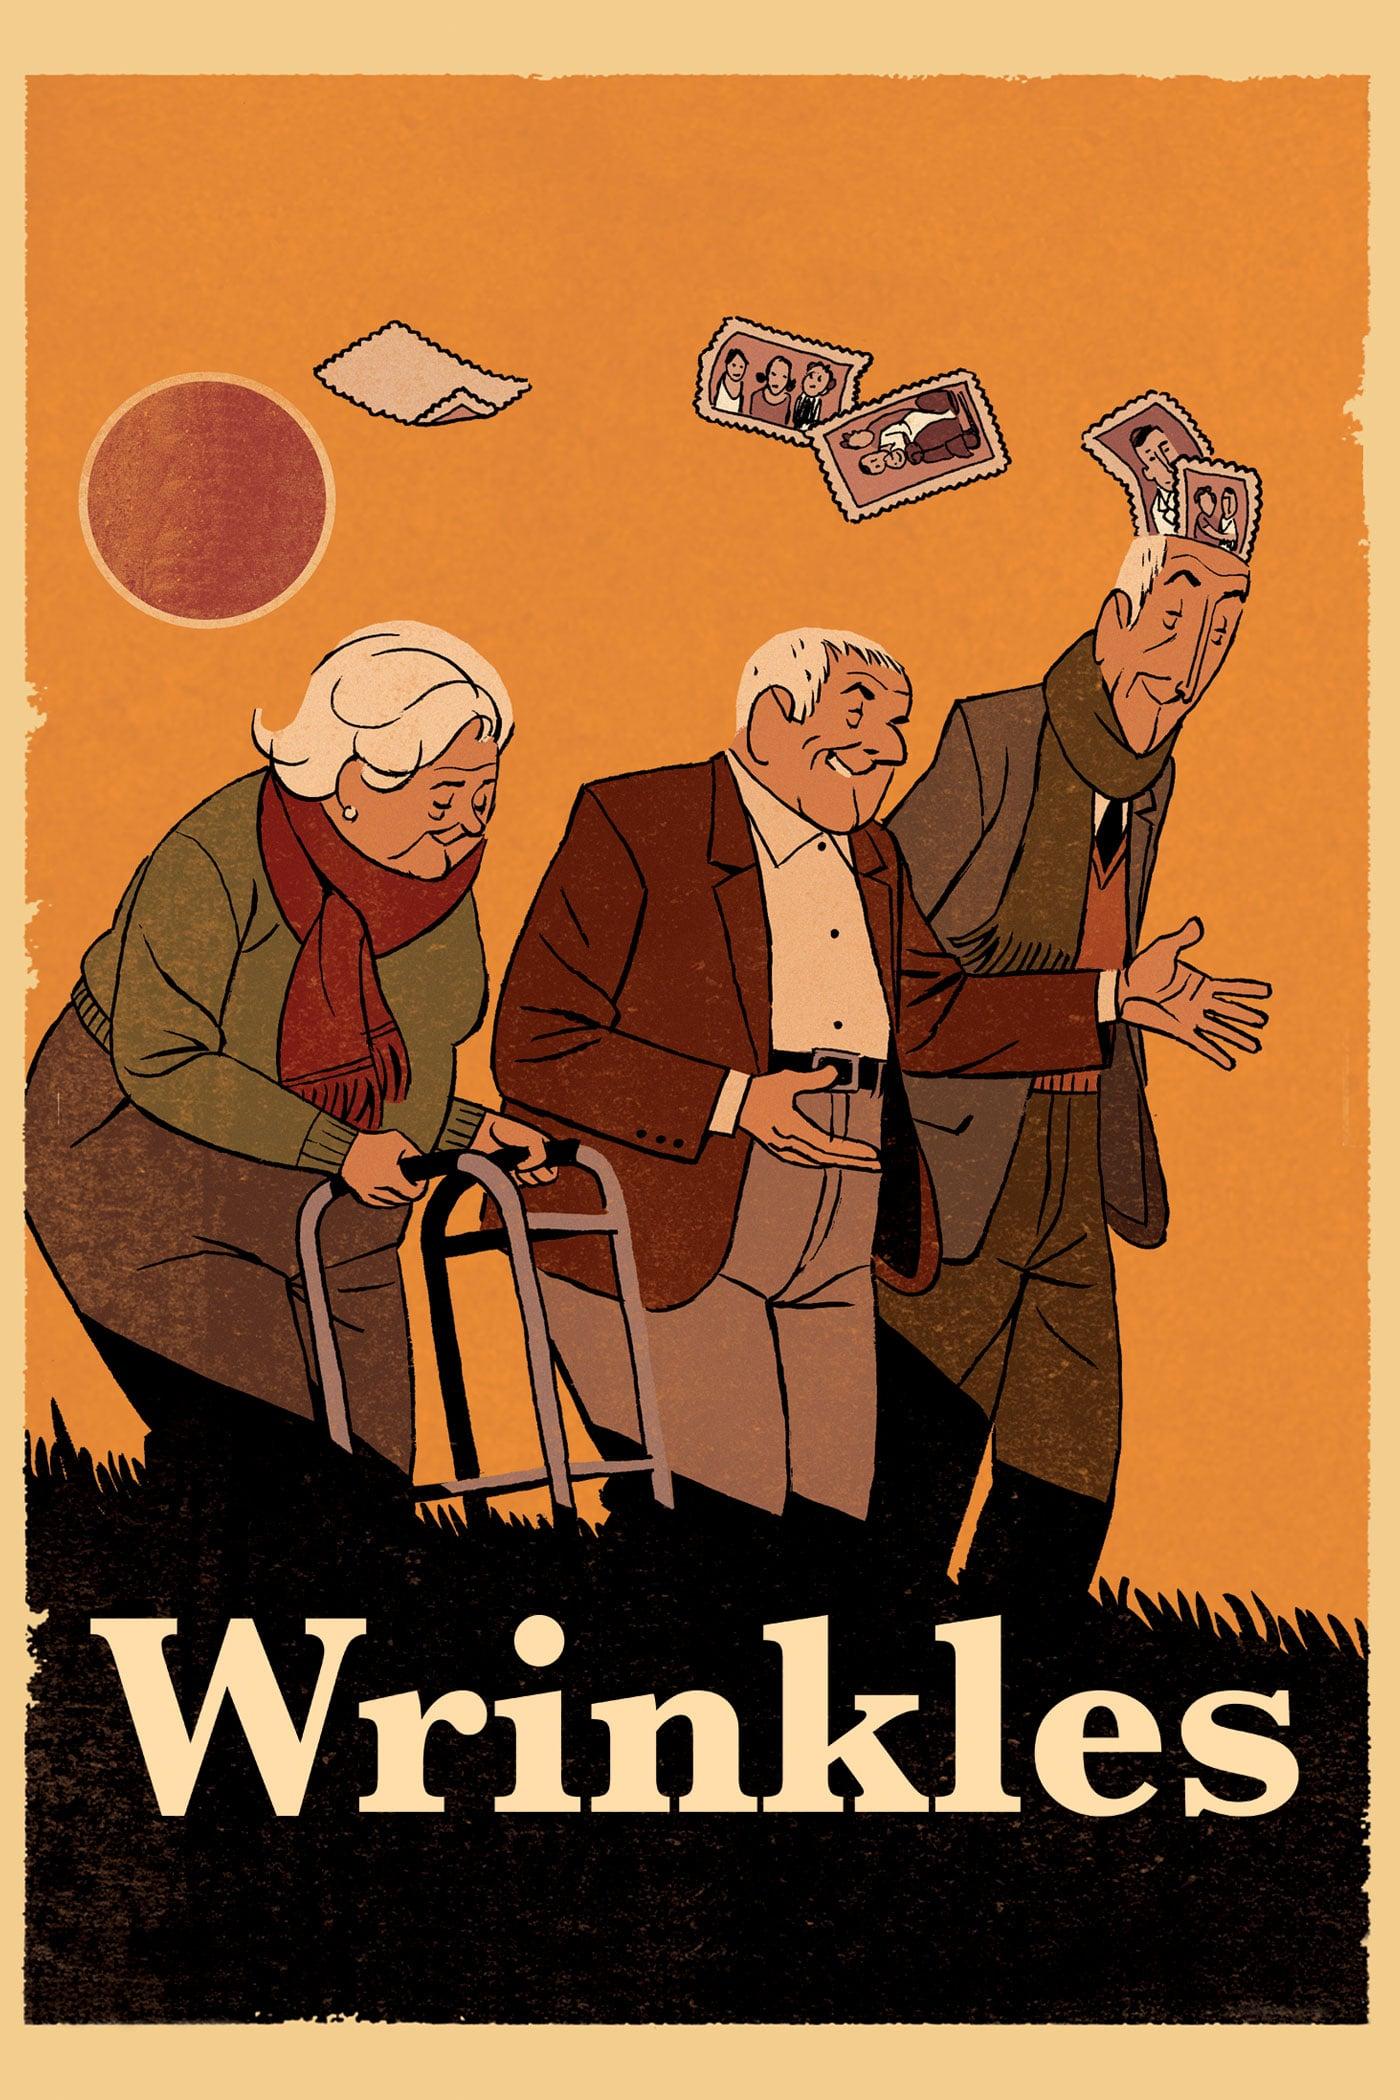 دانلود انیمیشن Wrinkles 2011